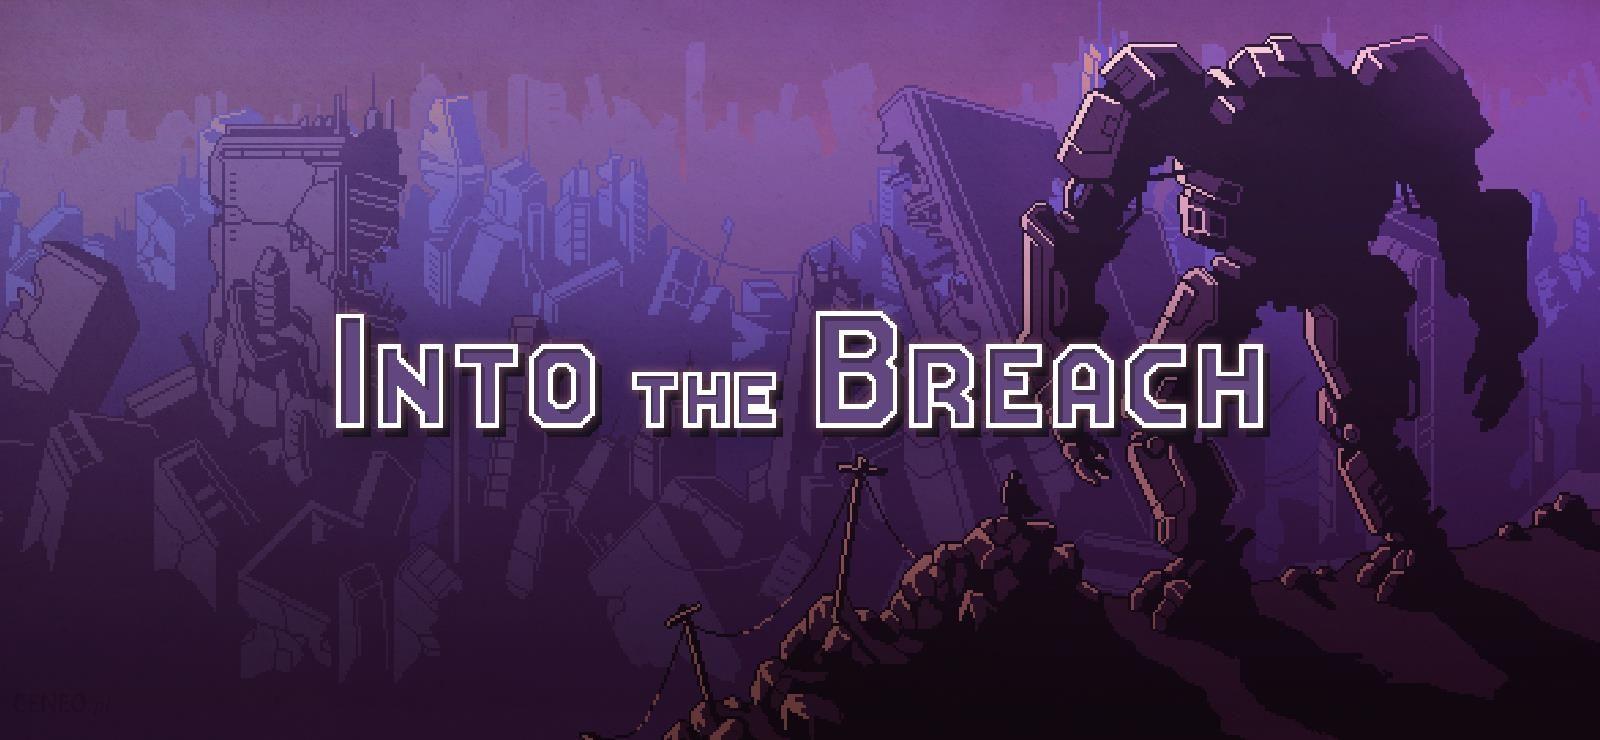 Into the Breach (Digital) od 13,92 zł, opinie - Ceneo.pl